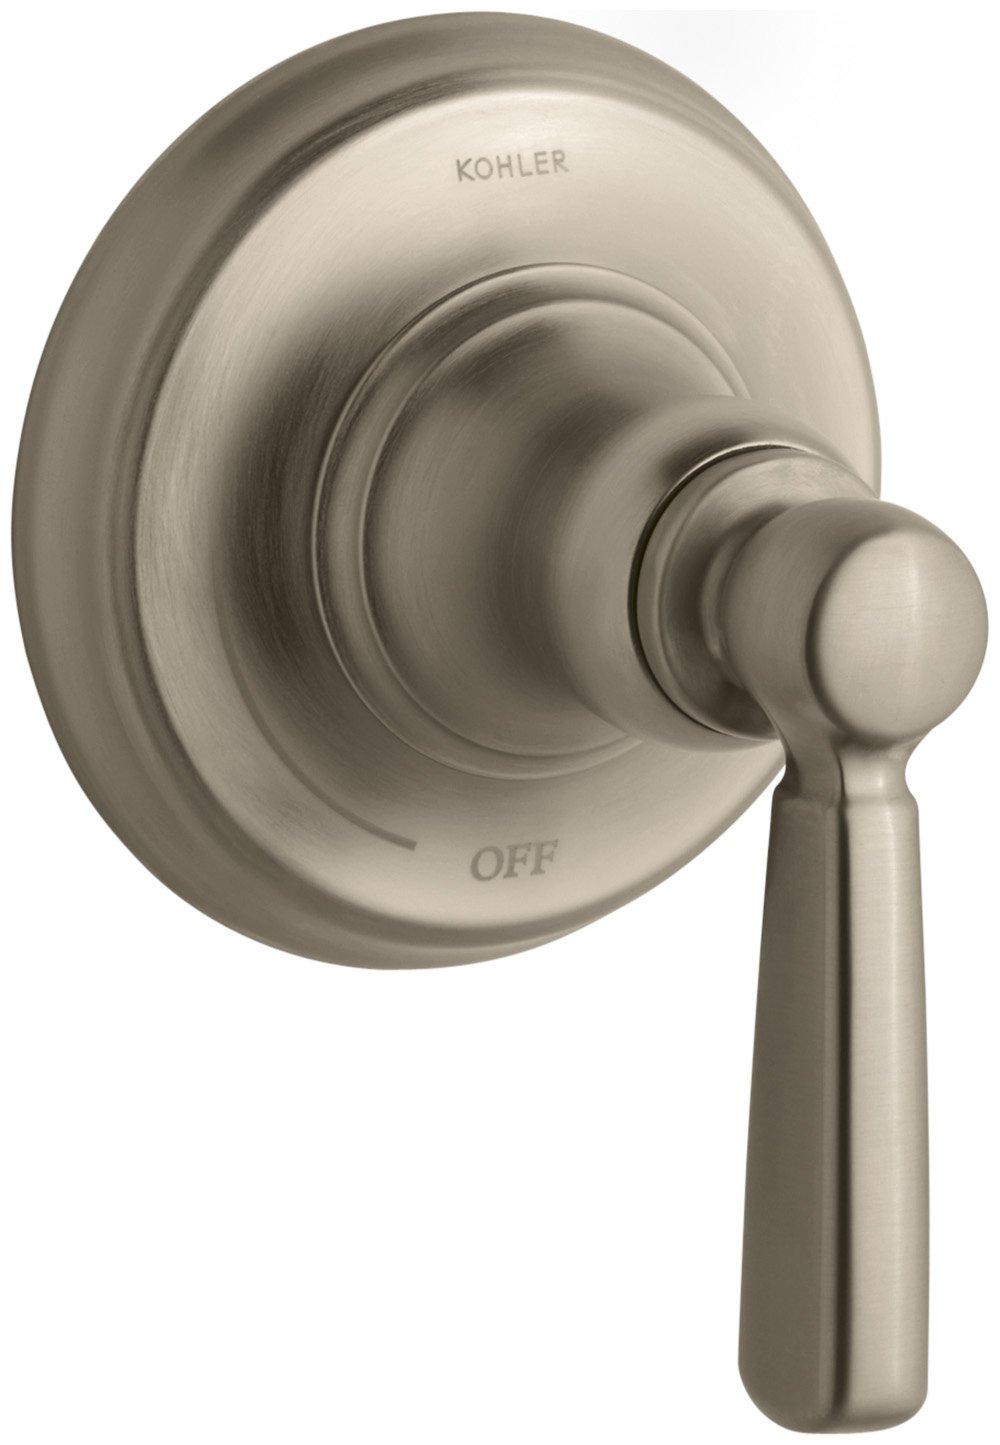 KOHLER K-T10596-4-CP Bancroft Volume Control Trim, Polished Chrome ...